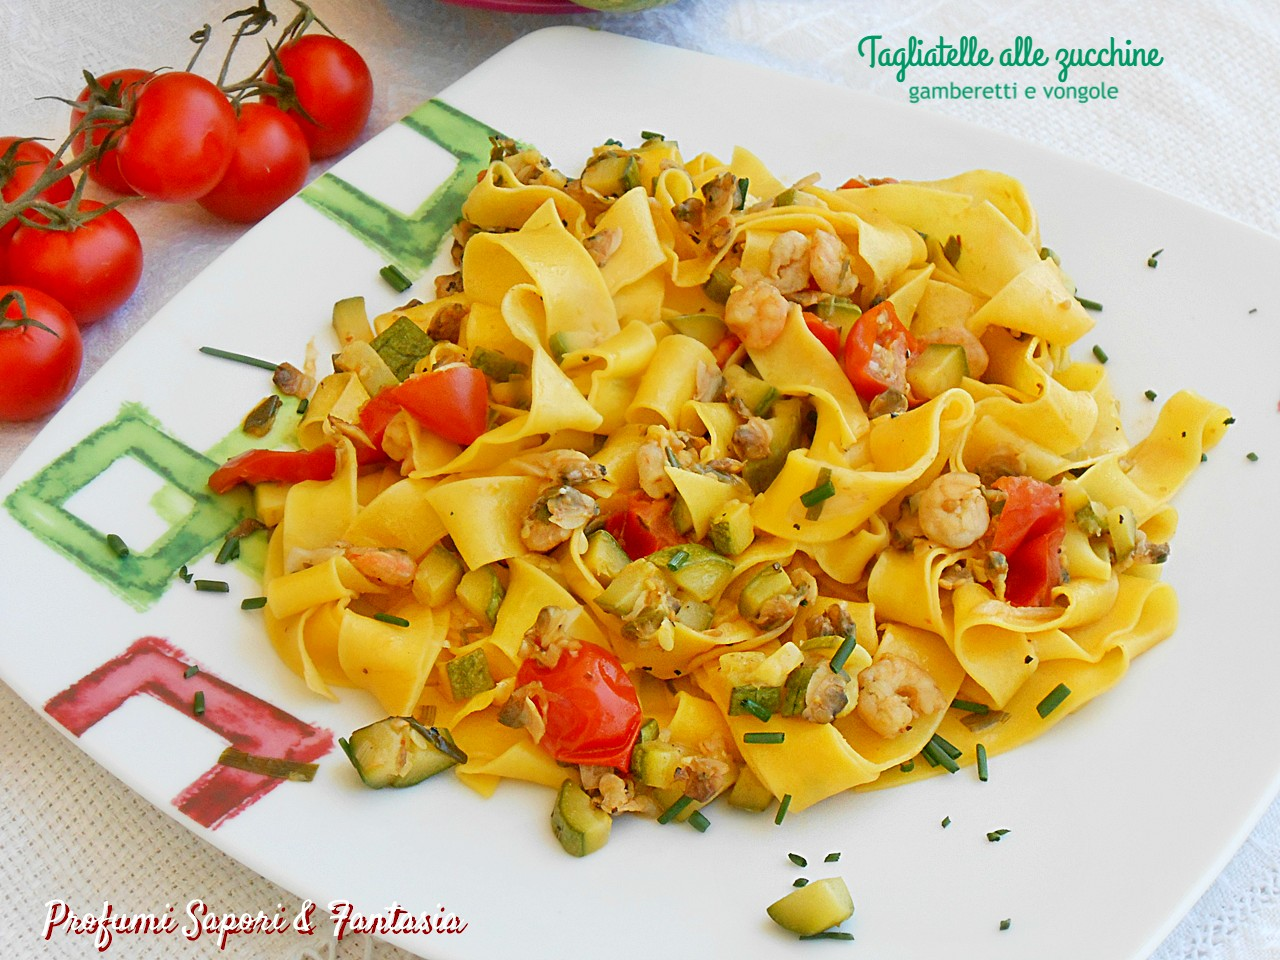 Ricetta Vongole Zucchine E Gamberetti.Tagliatelle Con Zucchine Gamberetti E Vongole Profumi Sapori Fantasia